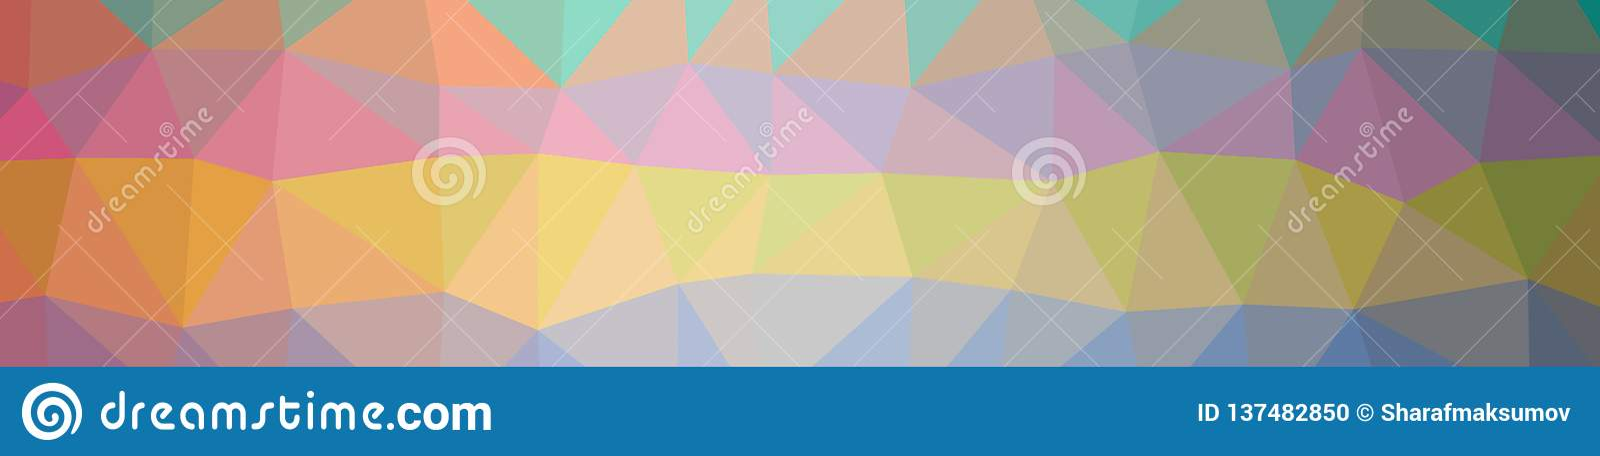 Illustration Of Abstract Orange Banner Low Poly Background - Facet Design Pattern